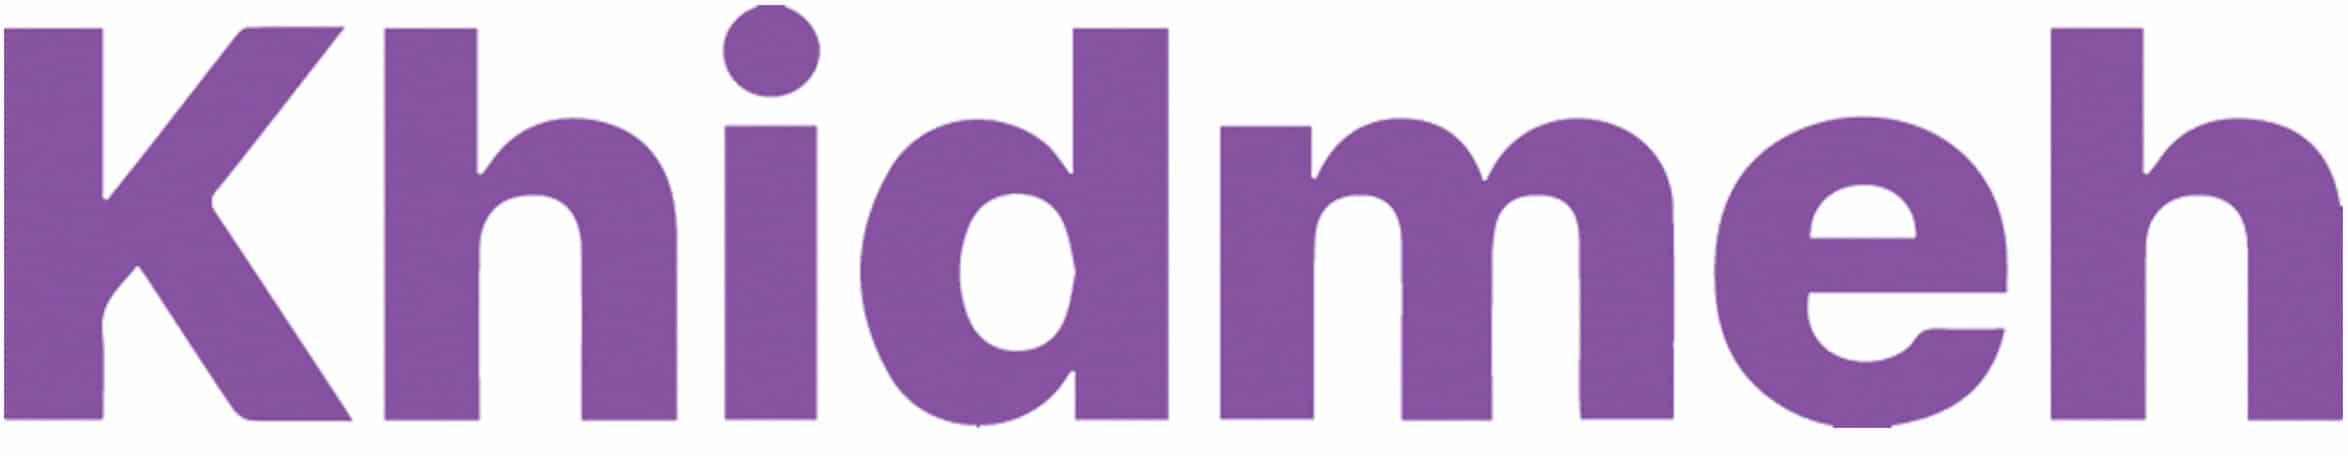 Khidmeh_long_logo